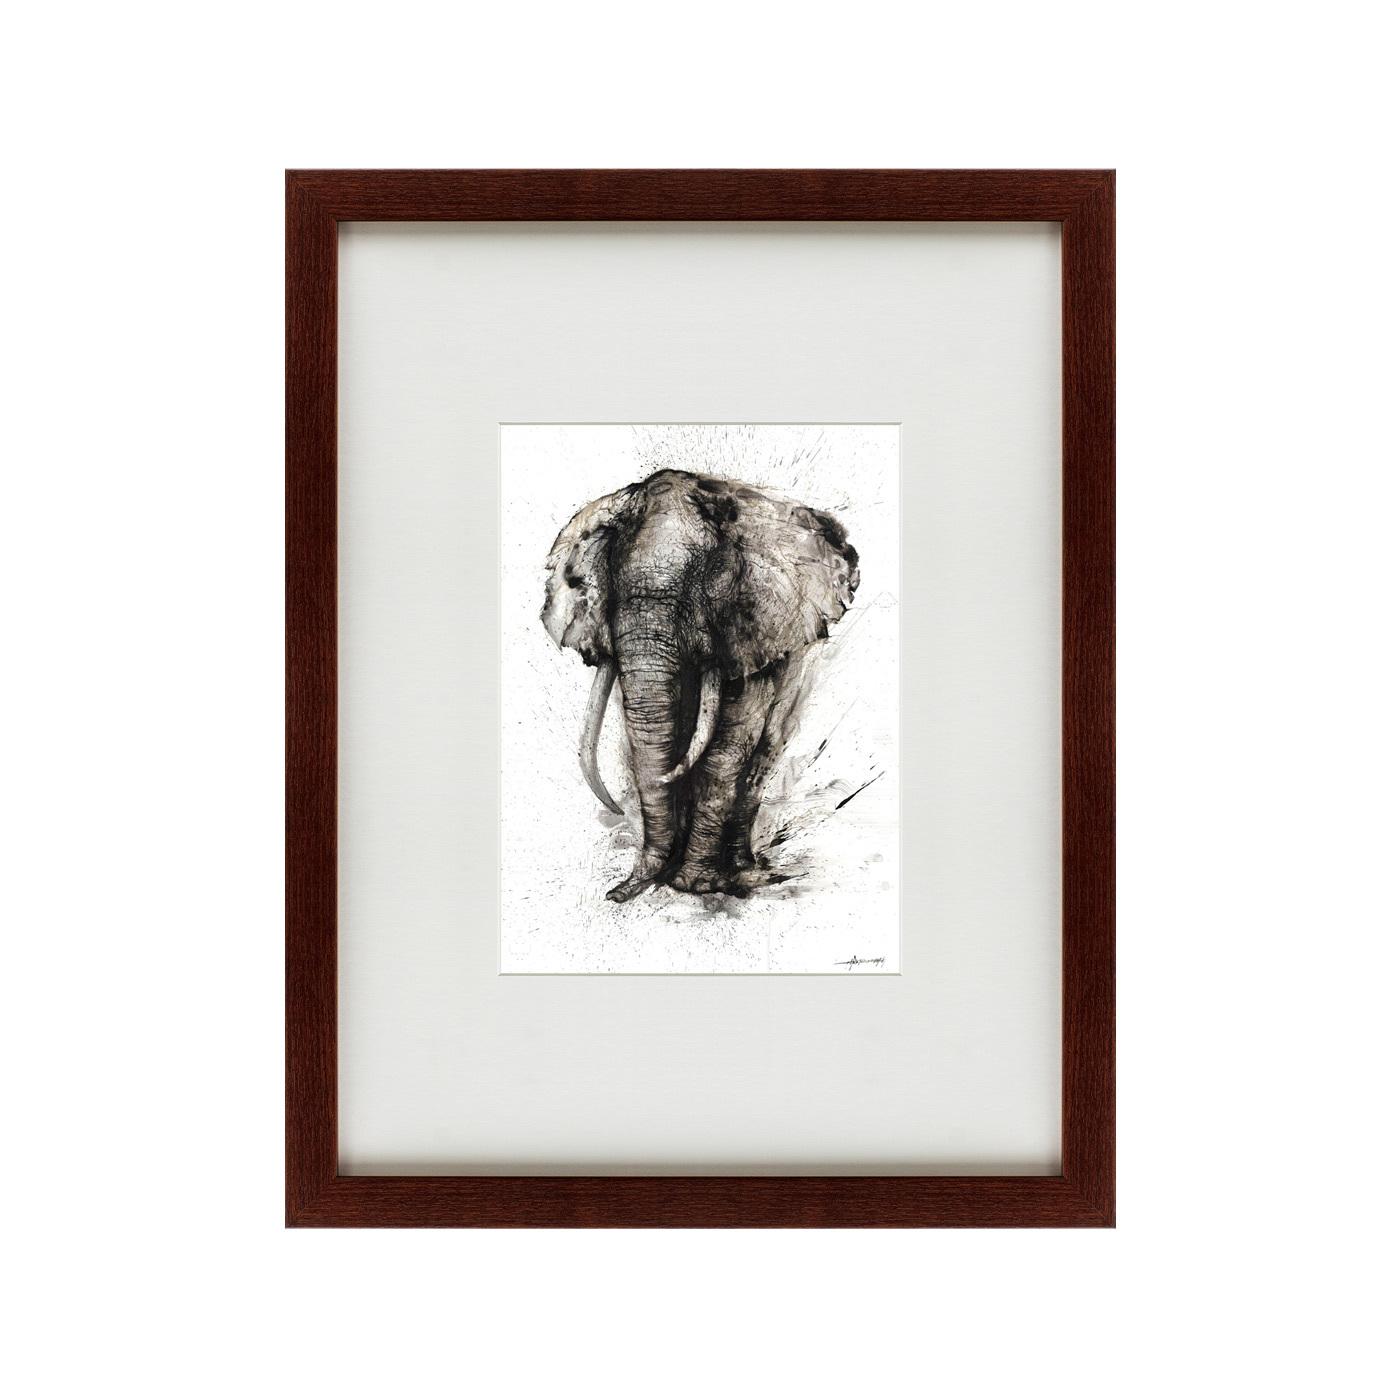 {} Картины в Квартиру Картина Слон-Мудрость (47х60 см) картины в квартиру картина пилигрим из мешхеда 47х60 см